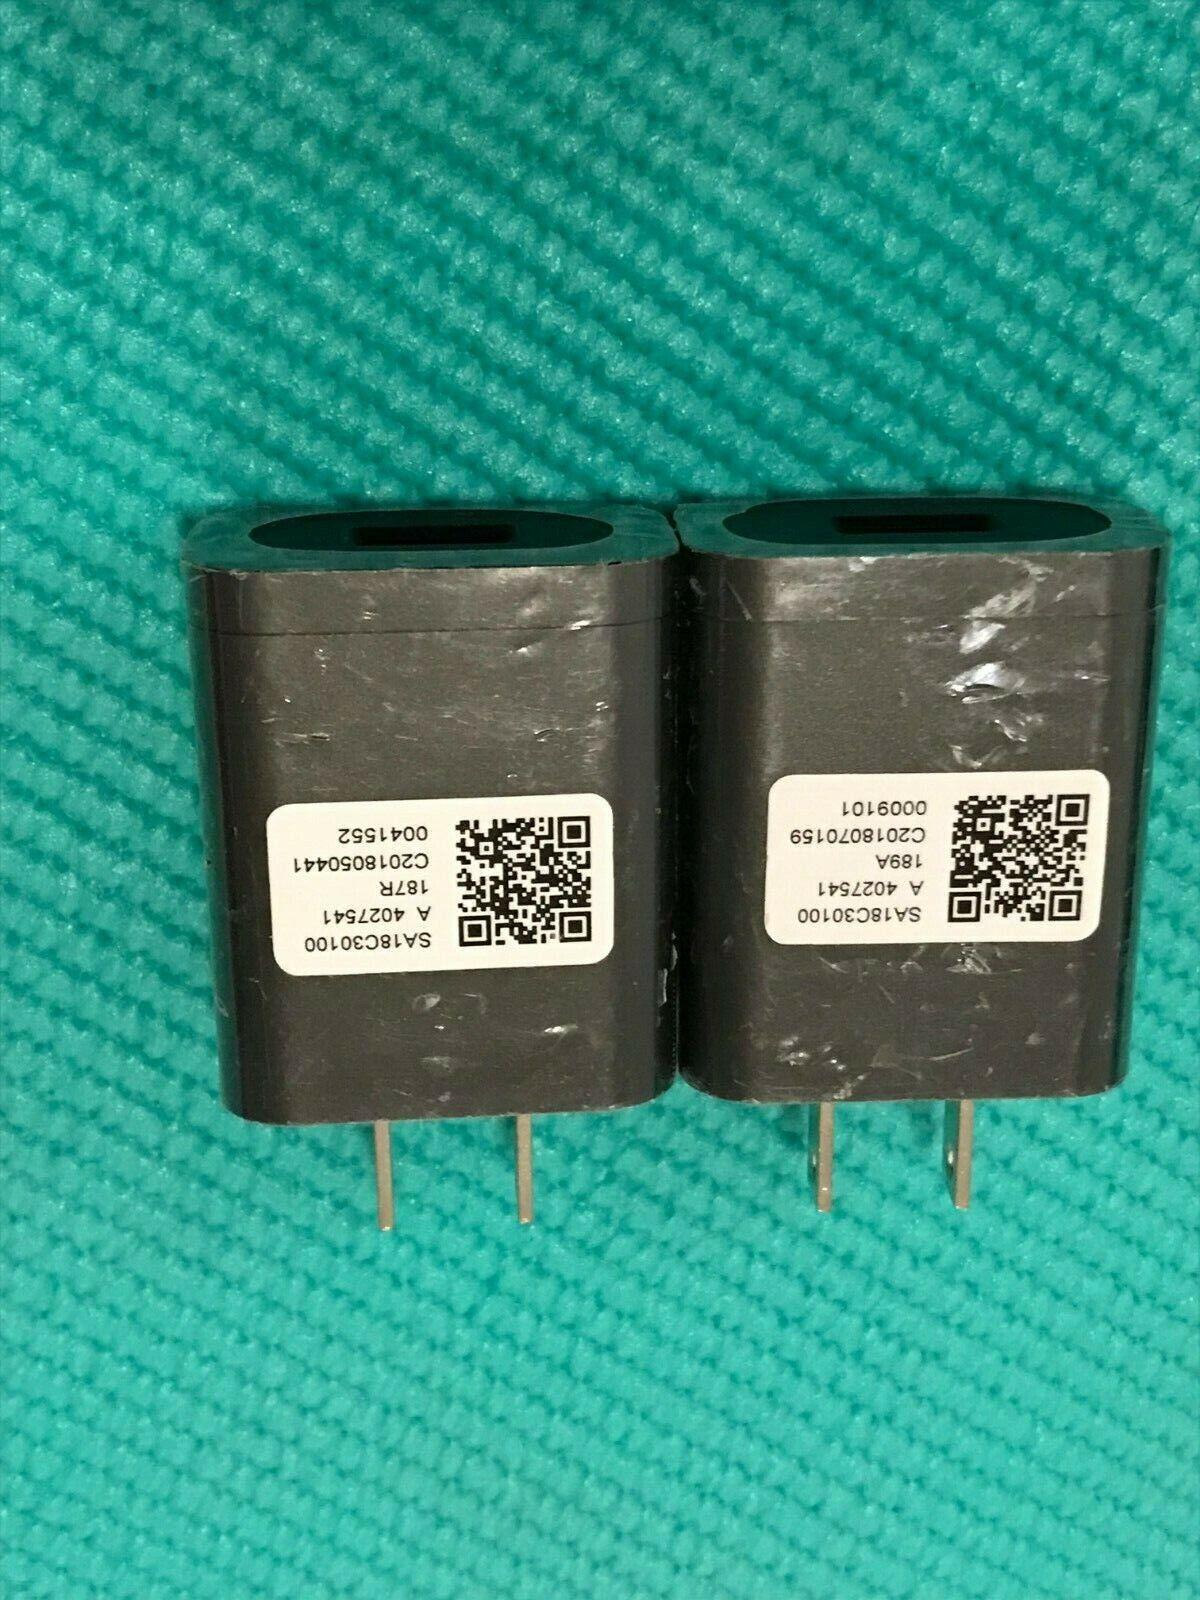 Motorola Turbo Power USB AC Power Wall Charger Black SC-51 S